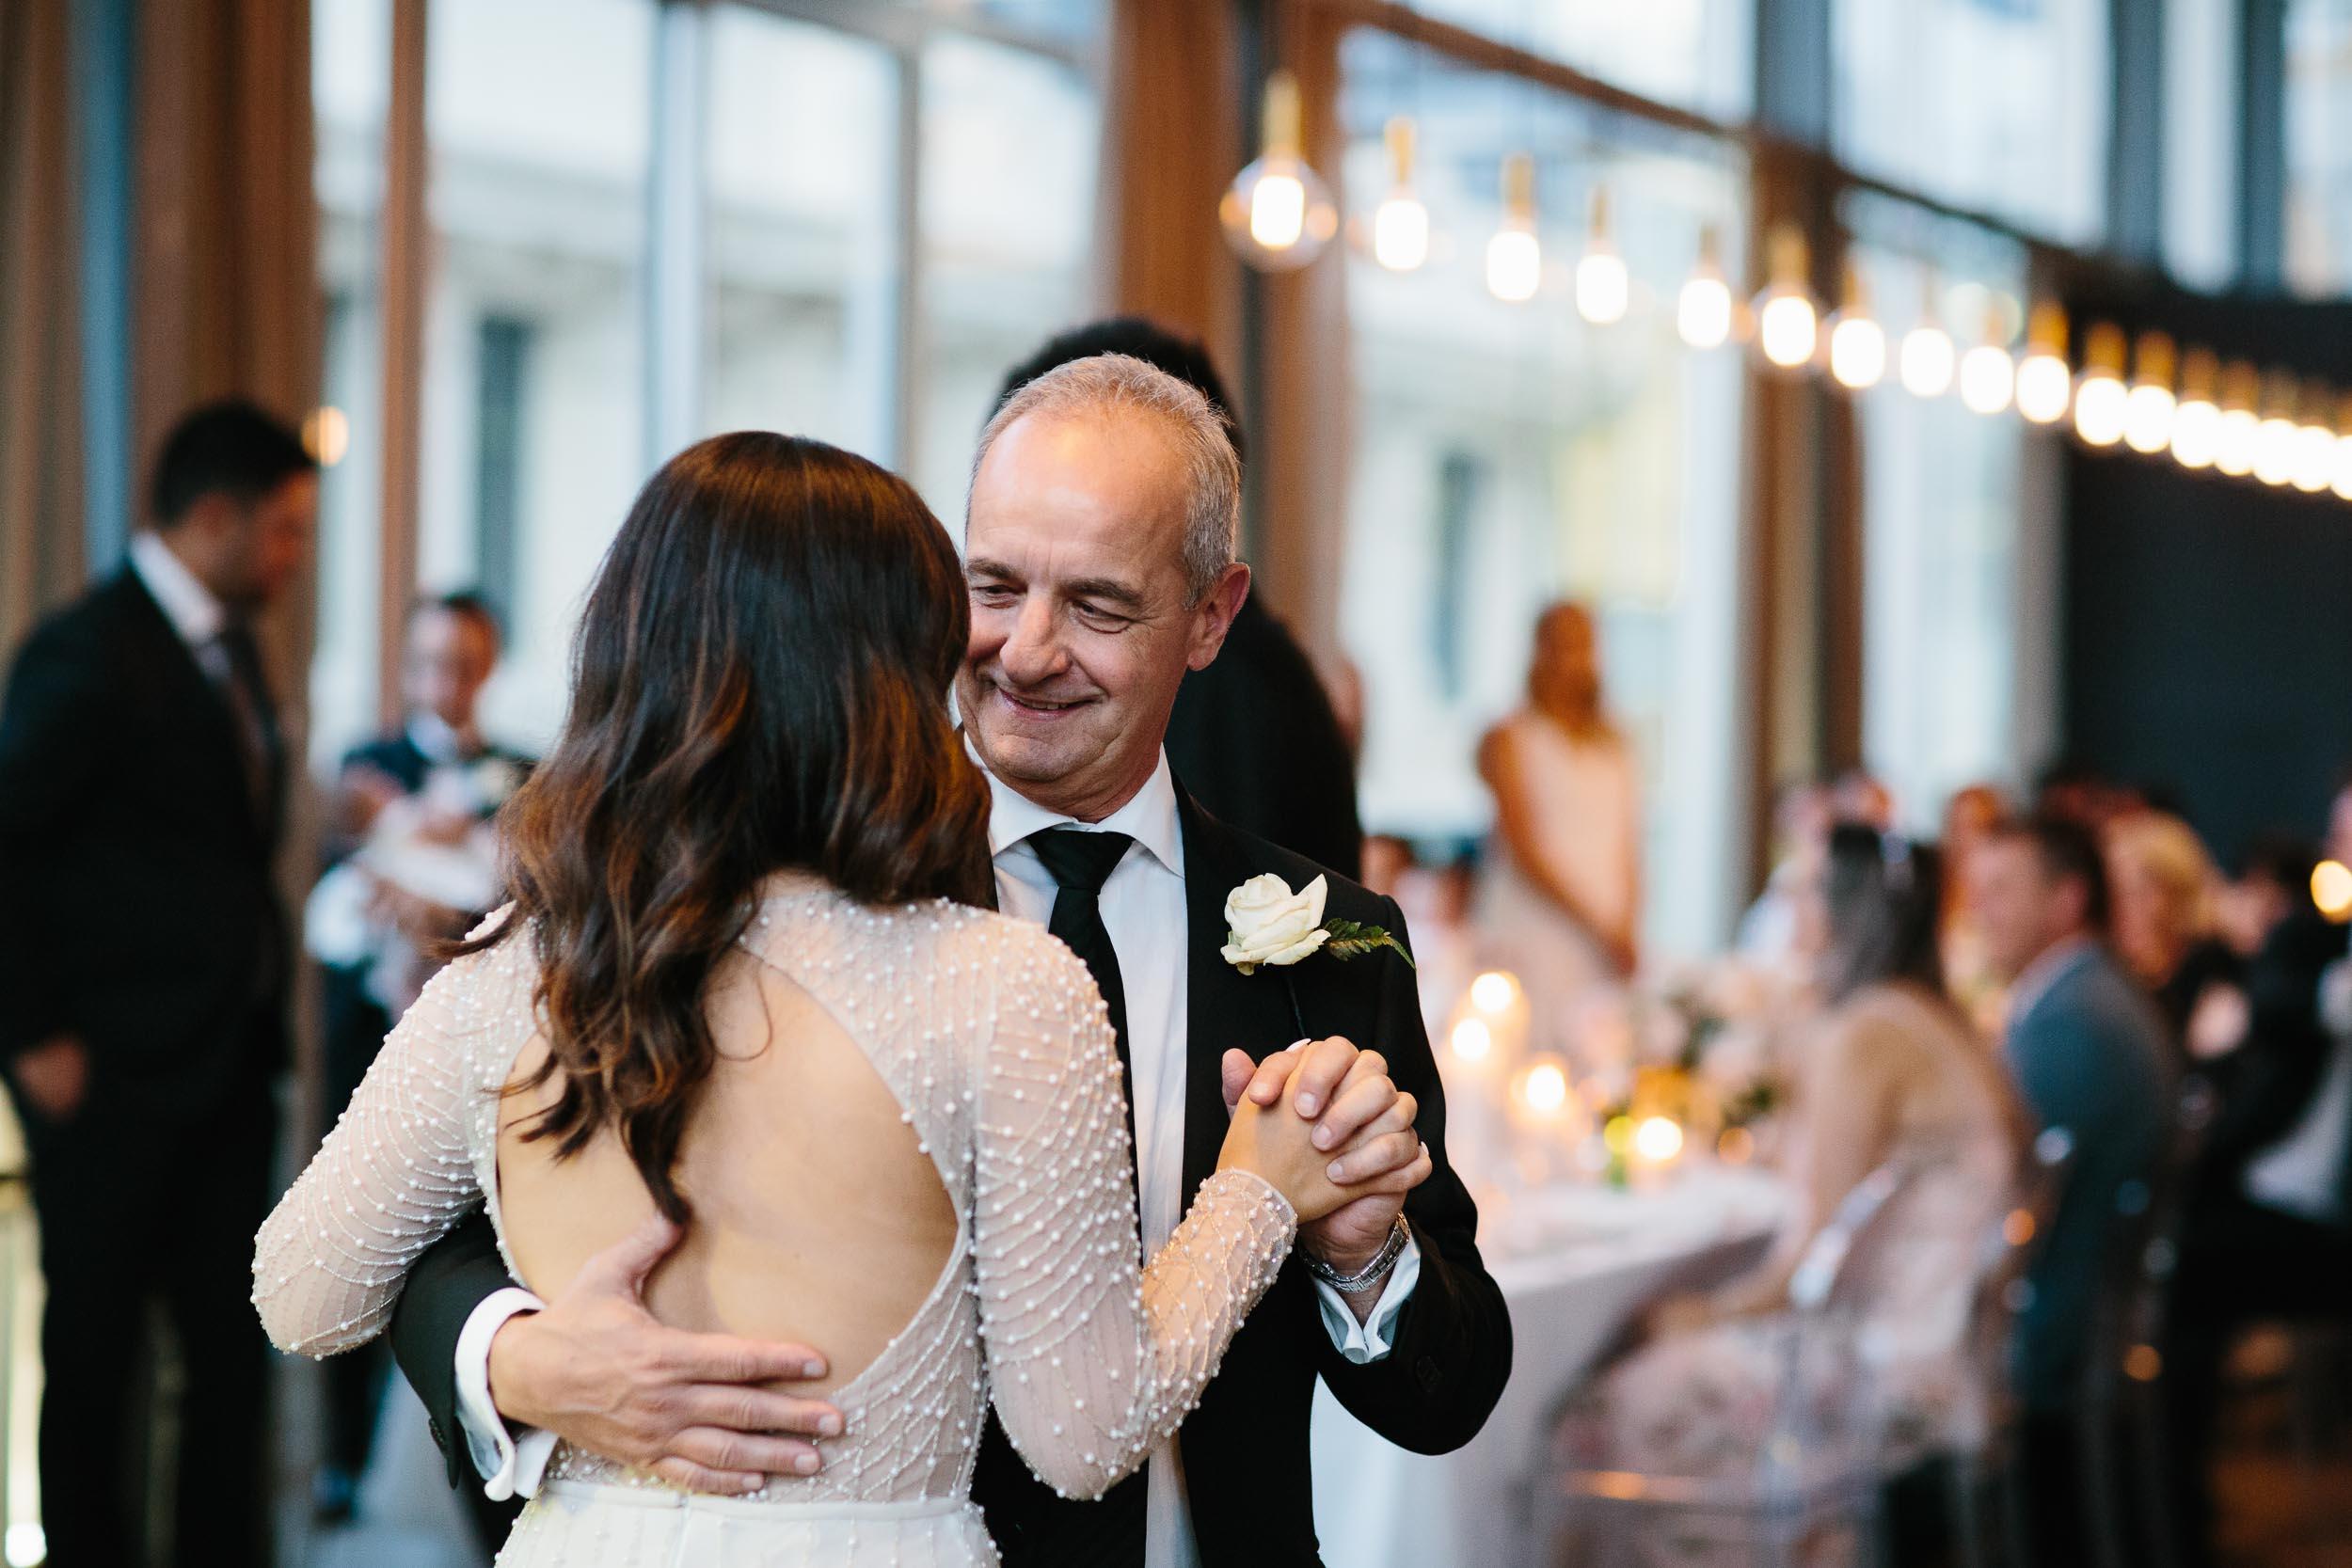 Kas-Richards-Wedding-Photographer-Melbourne-City-Wedding-Alto-Event-Space-Jane-Hill-Bridal-Gown-65.jpg